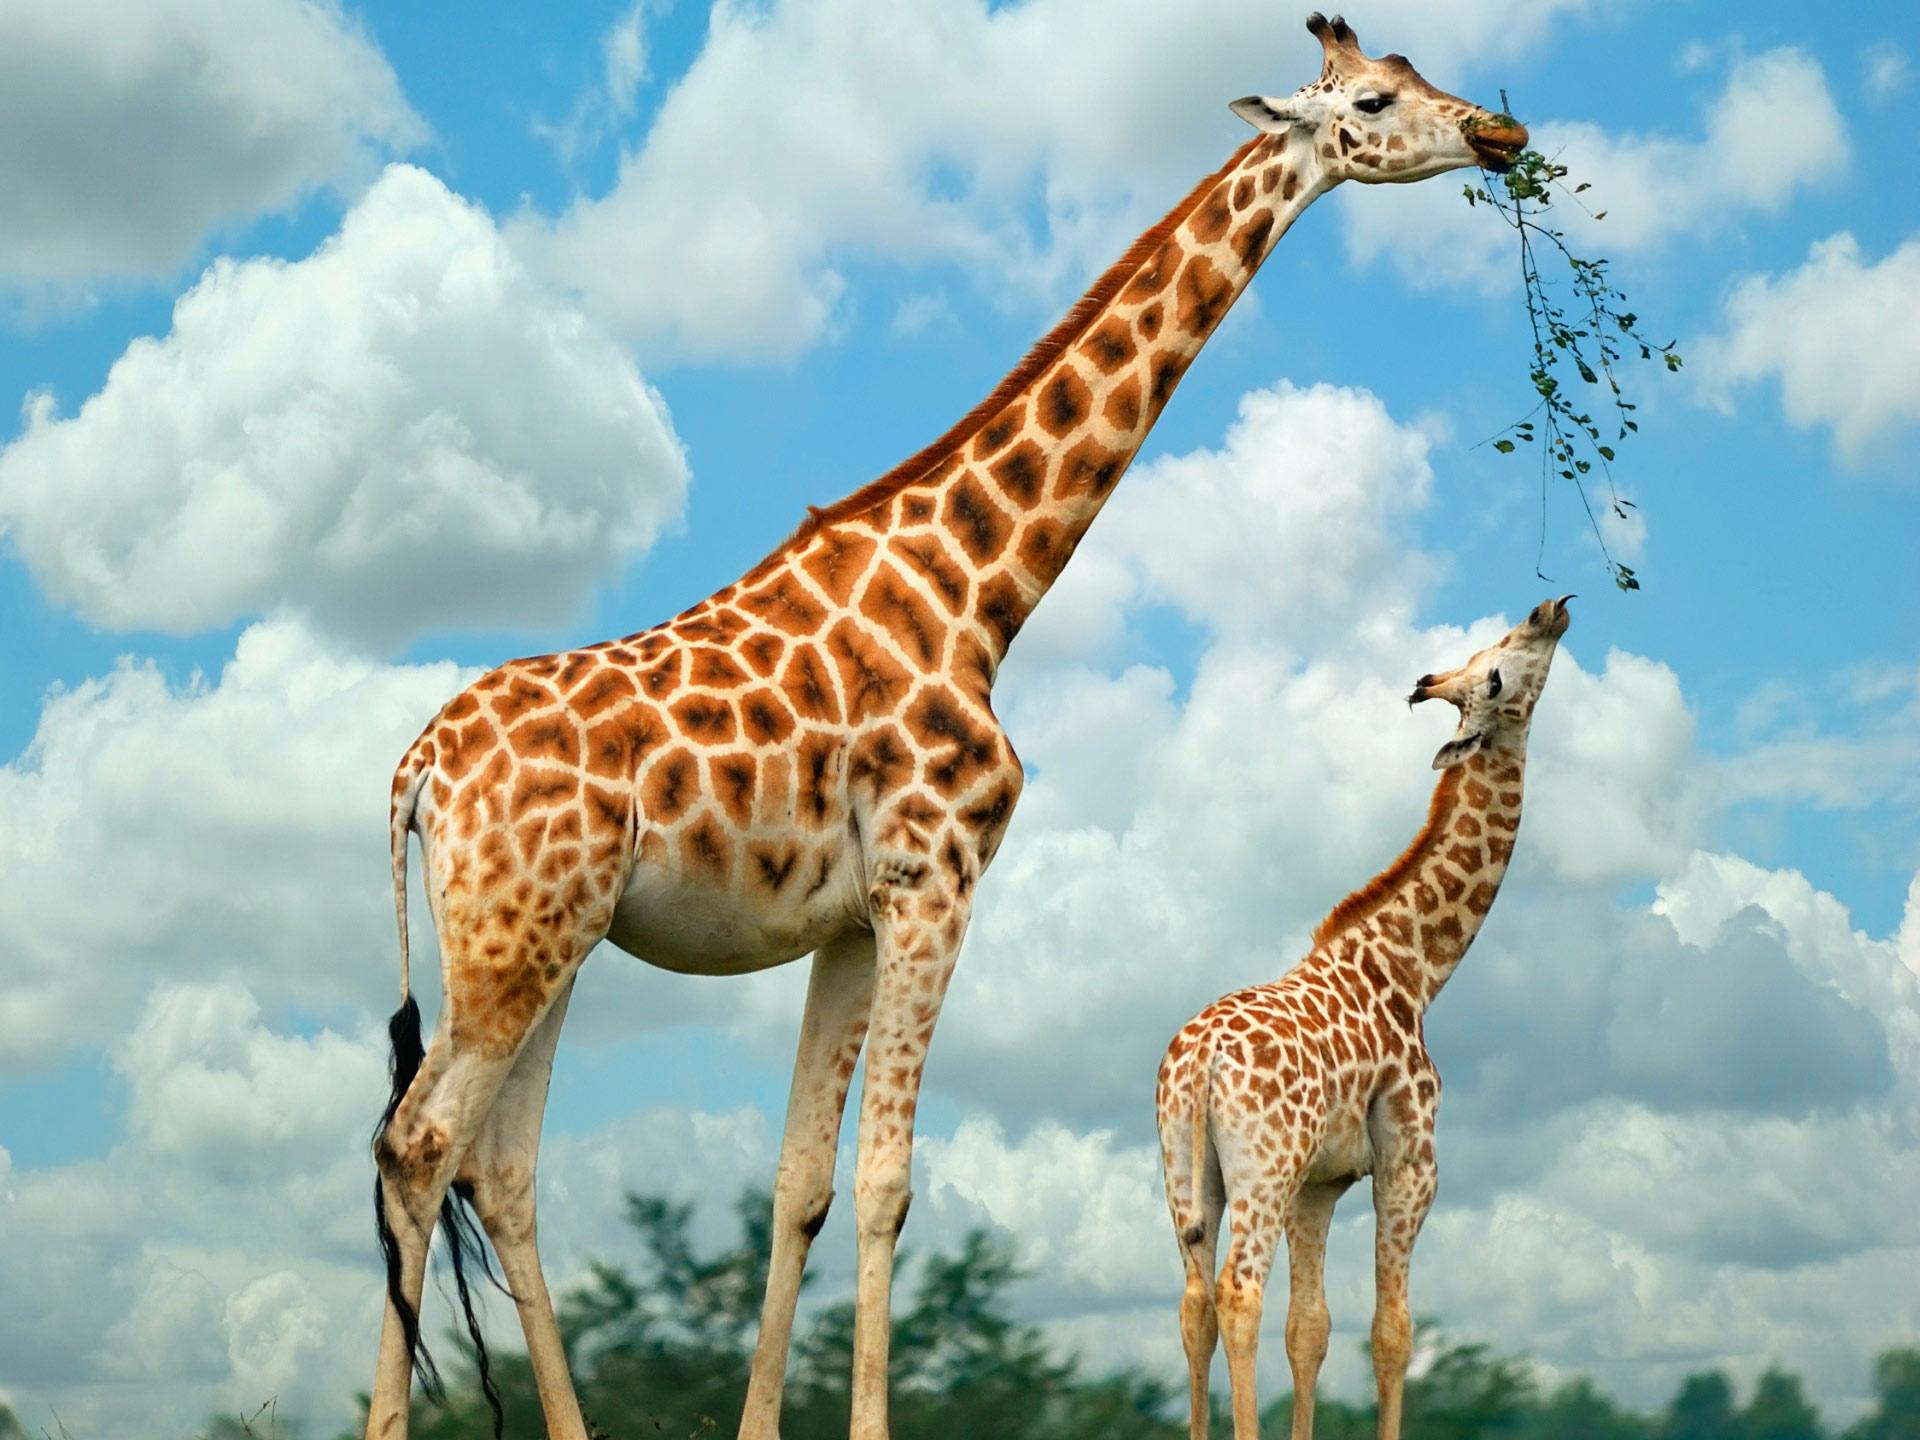 giraffe hd wallpapers free 3Djpg   Clip Art Library 1920x1440